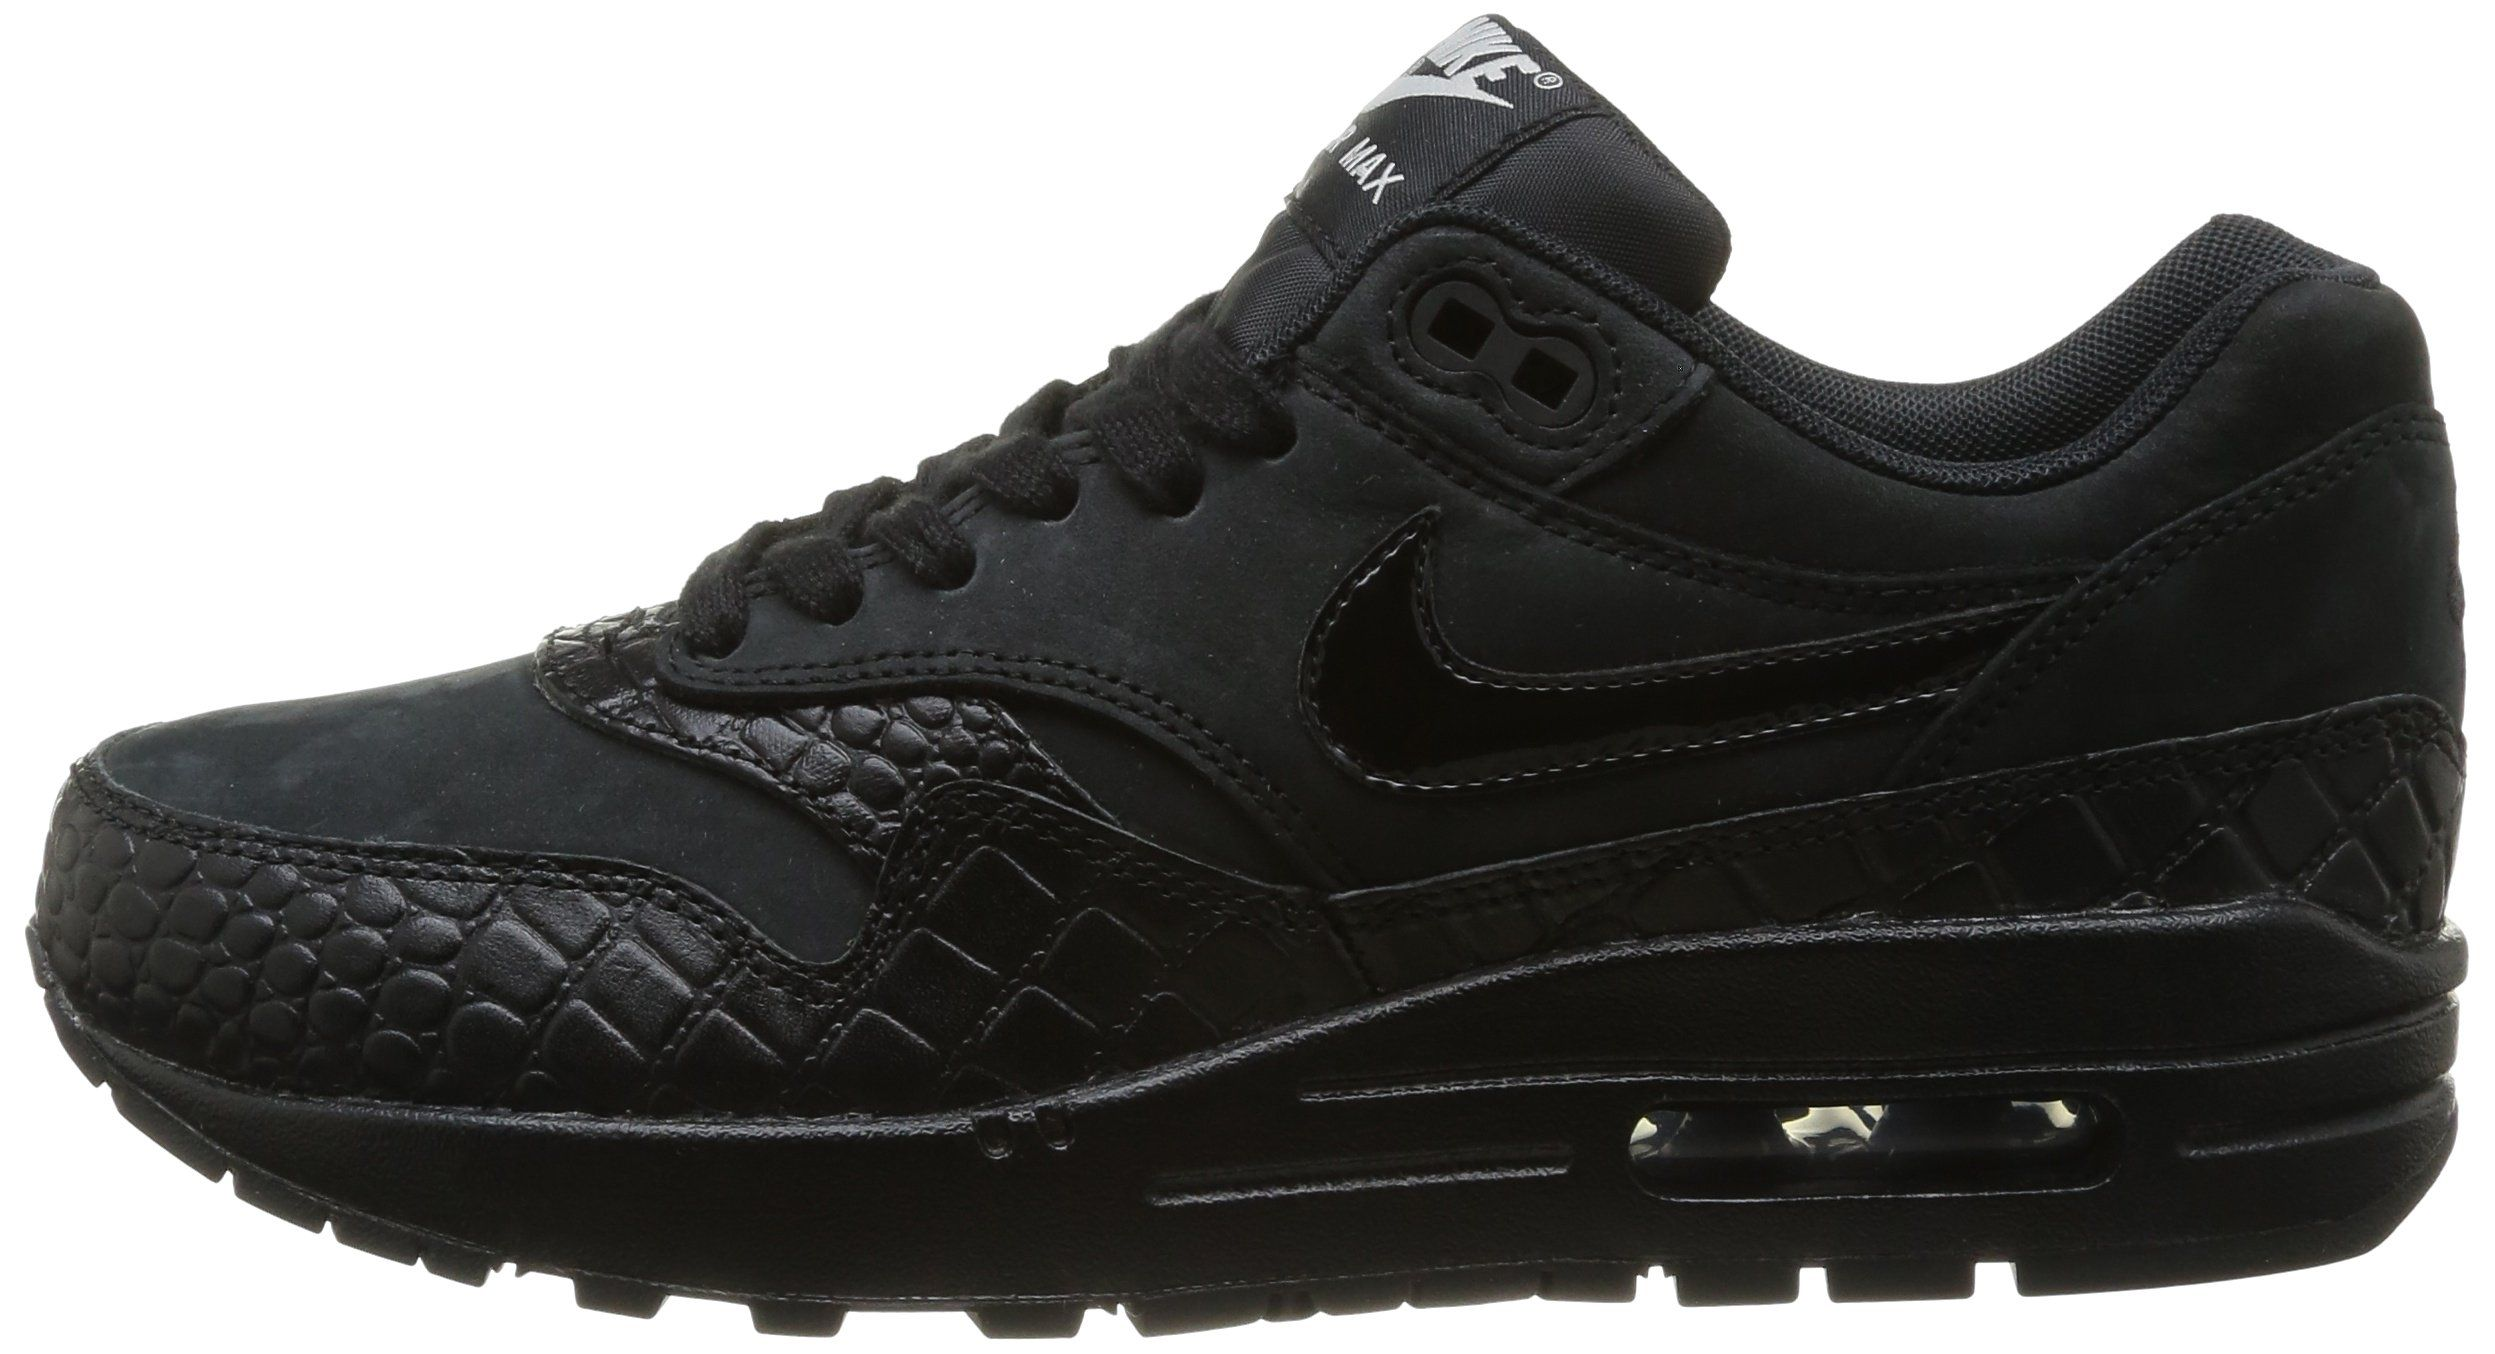 Nike Air Max 1 Prm, Chaussures de running femme - Multicolore (Black/Black